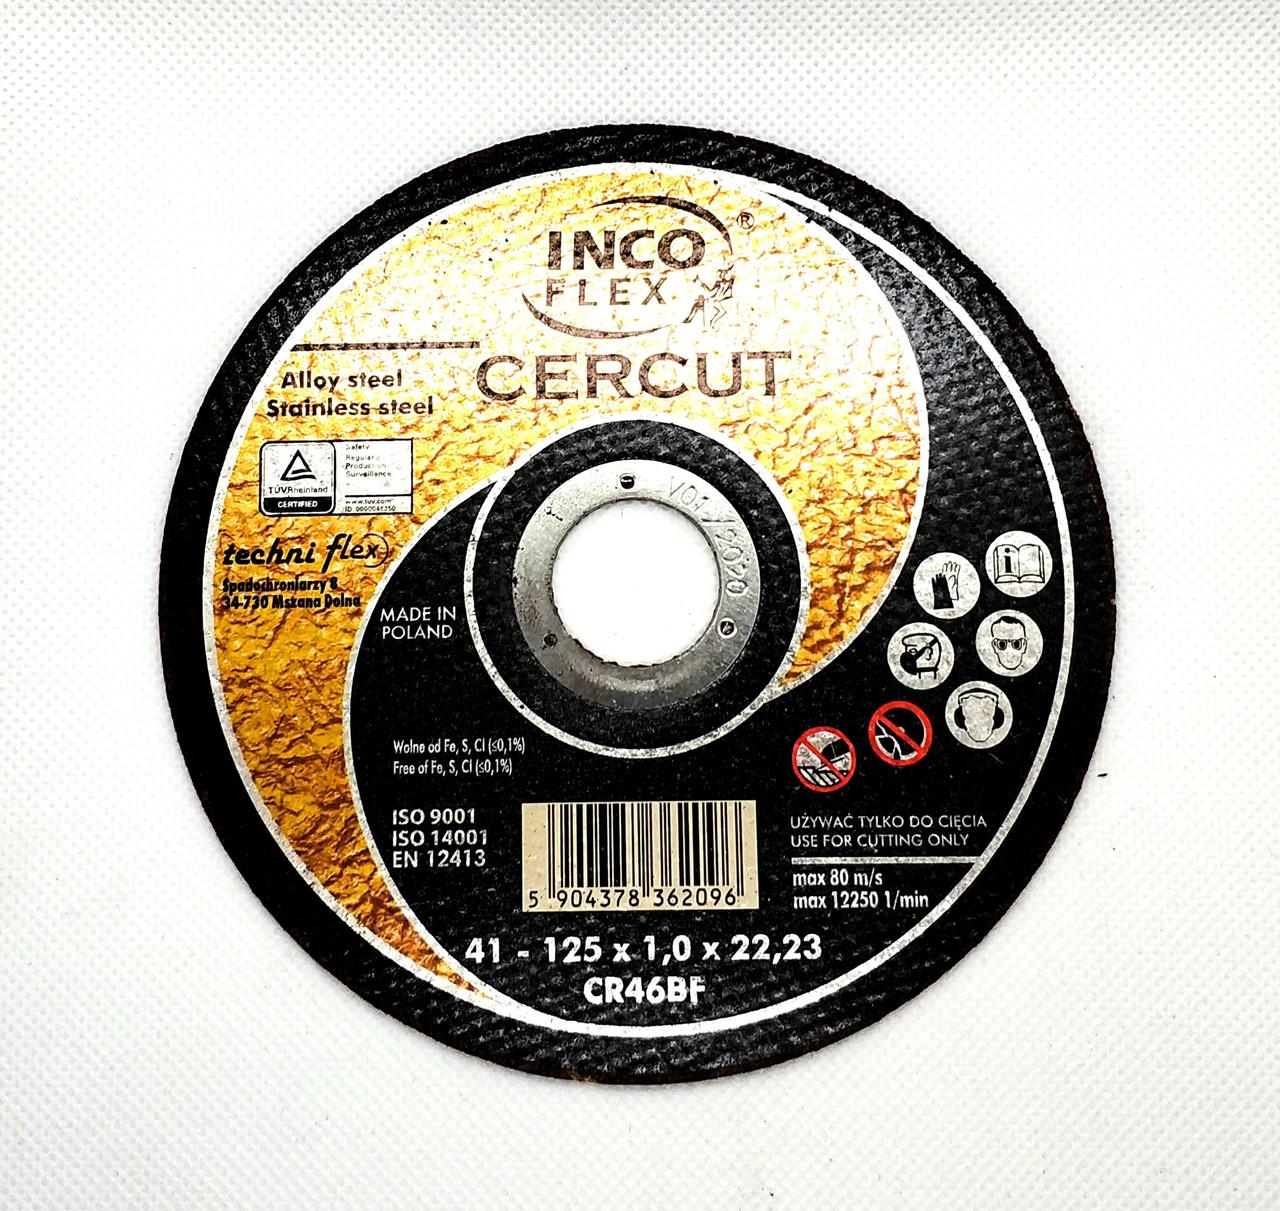 Круг отрезной по металлу 125х1,0x22,23мм, CR46BF-41, ceramics, IncoFlex (50)